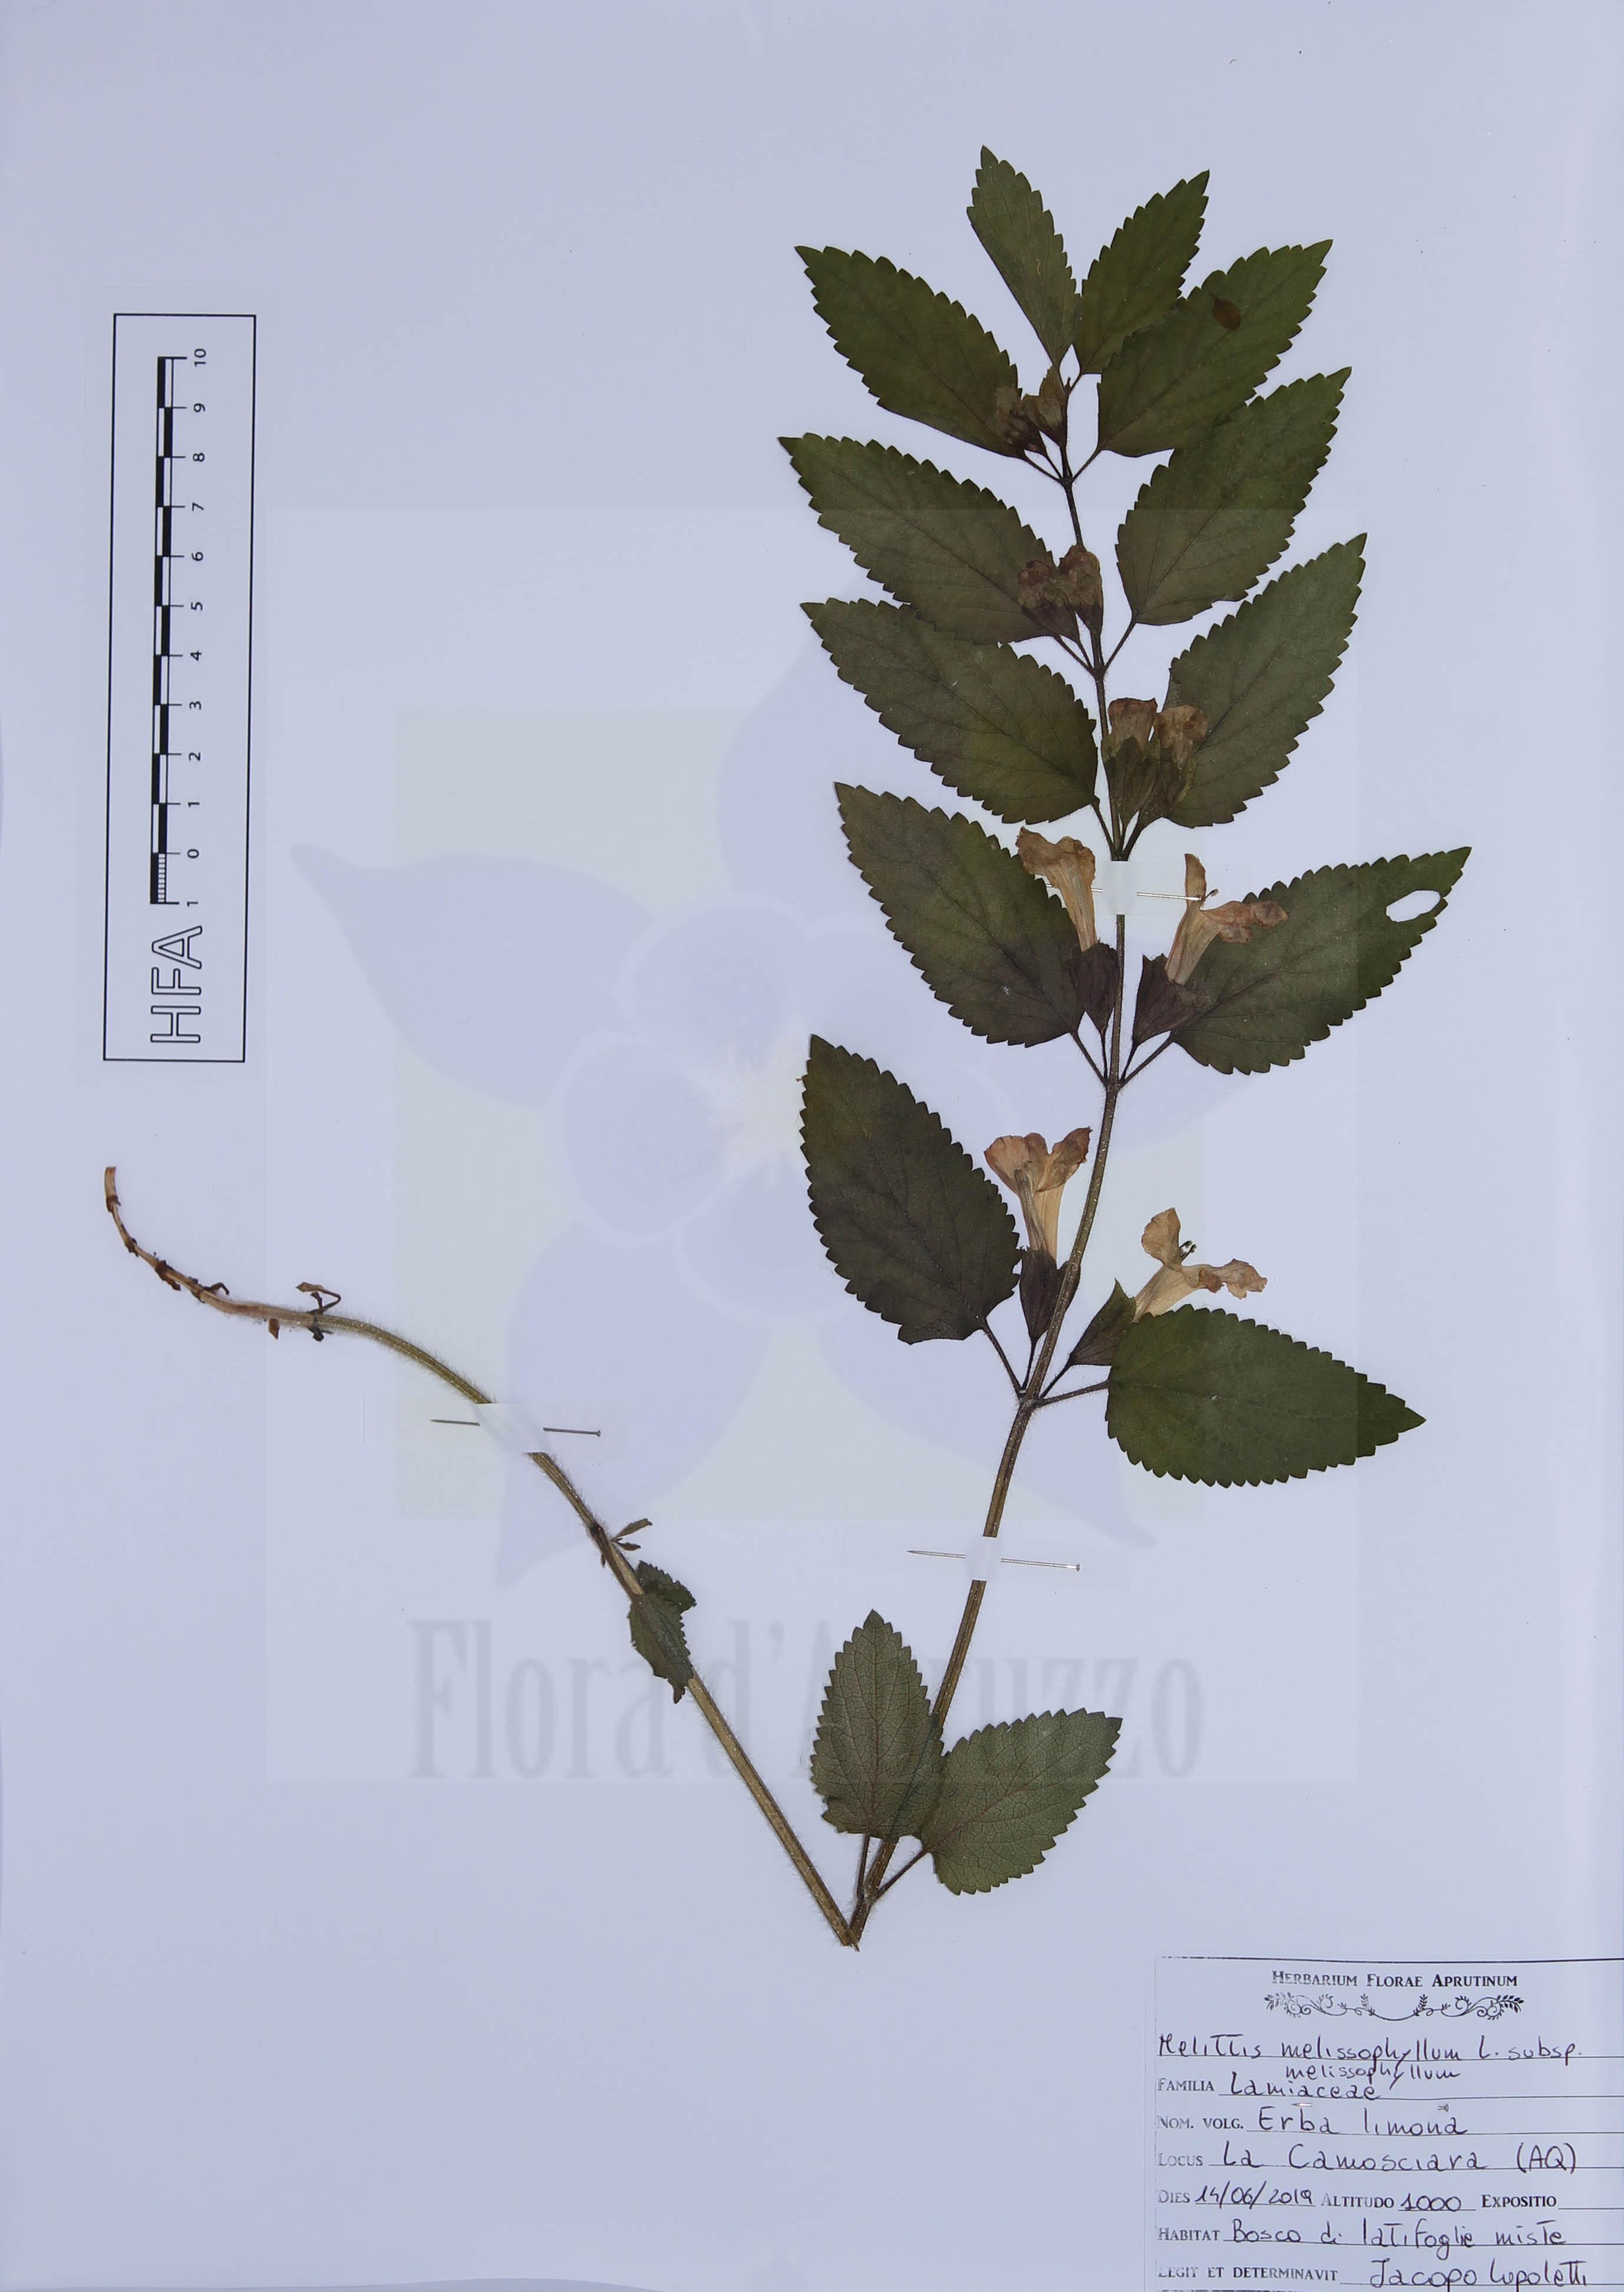 Melittis melissophyllum L. subsp. melissophyllum